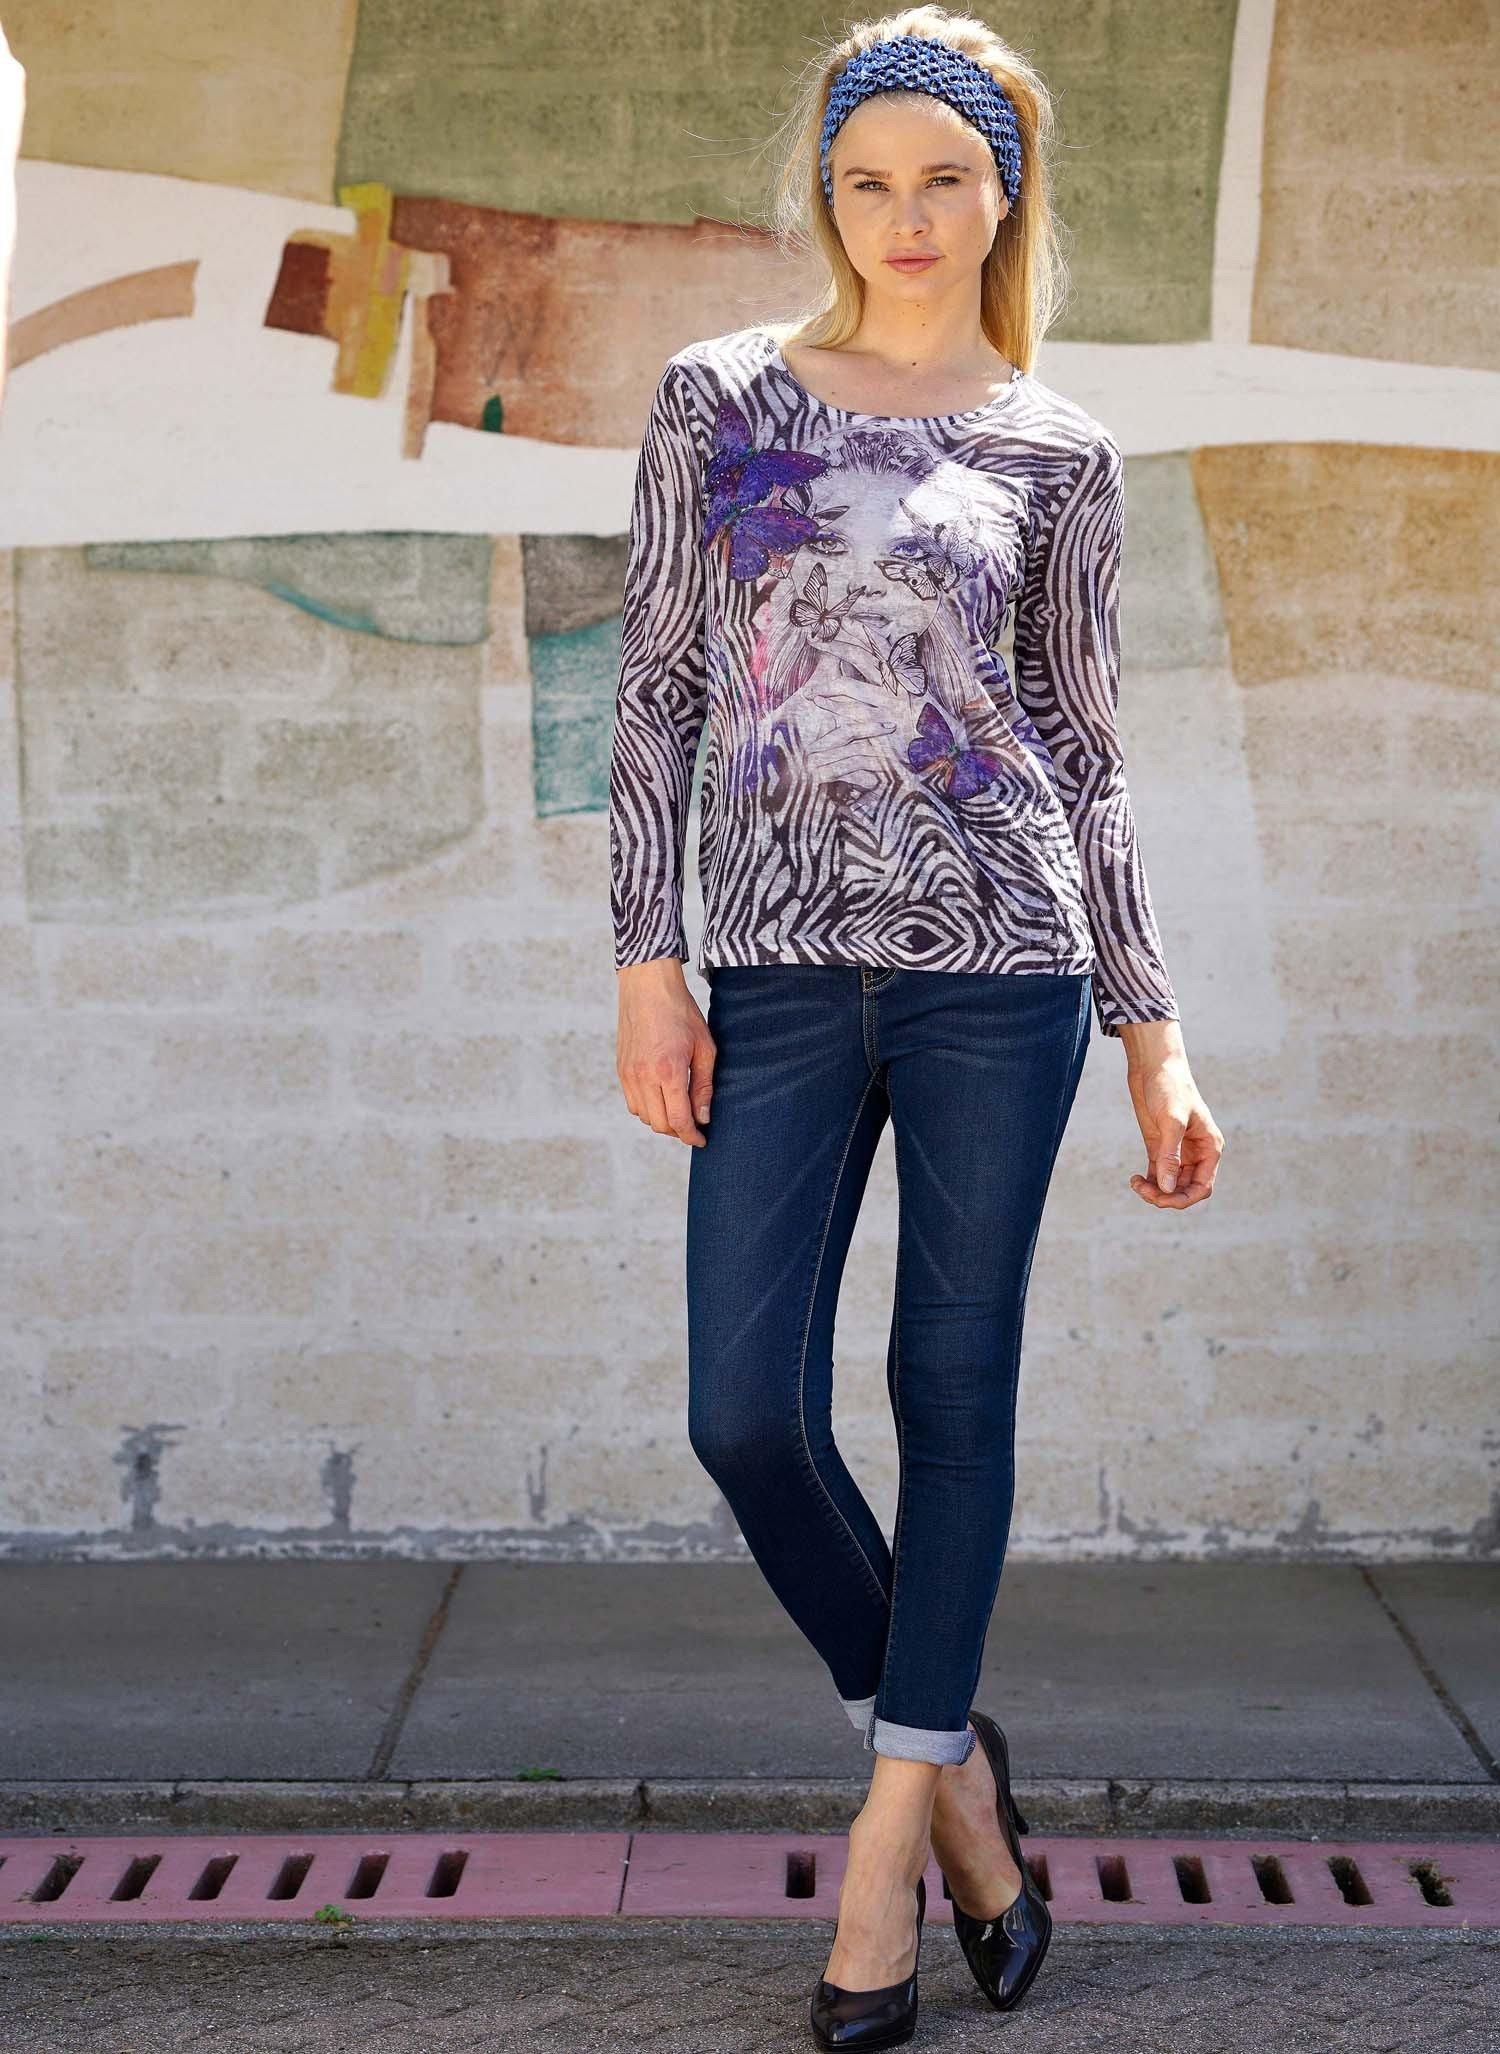 D-LA-Shirt,Girl/Schmetterling XL 058 - 2 - Ronja.ch